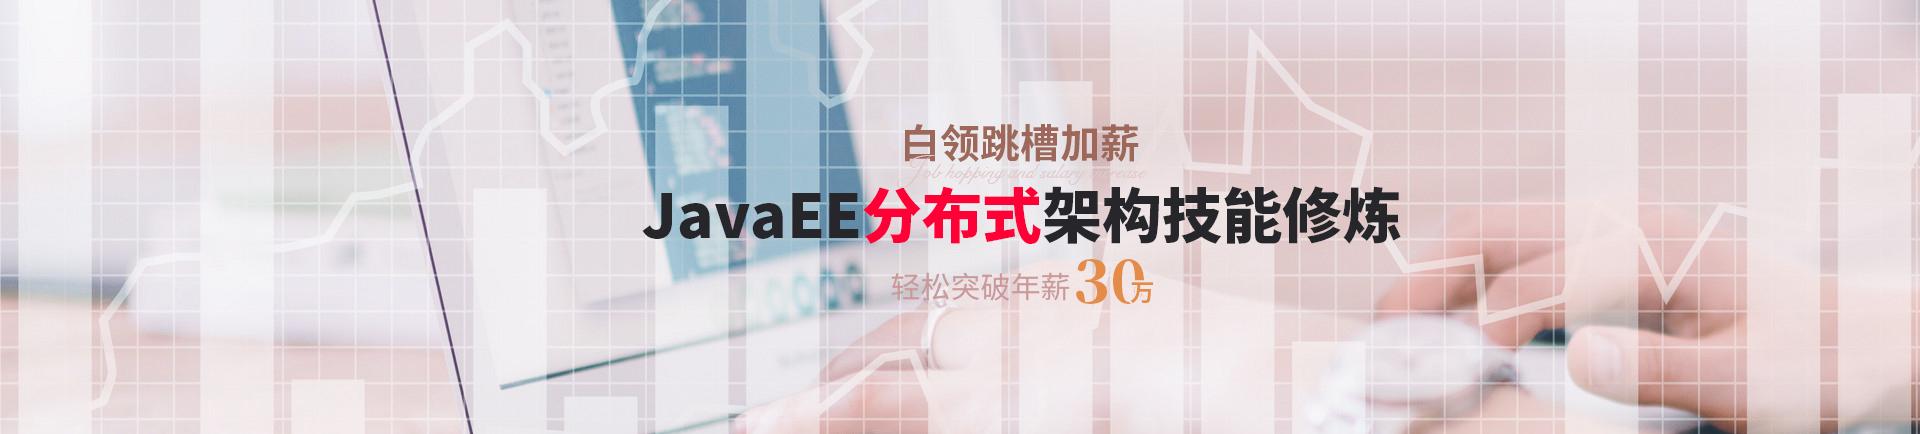 JavaEE分布�架构技能修炼 轻��破年薪30万